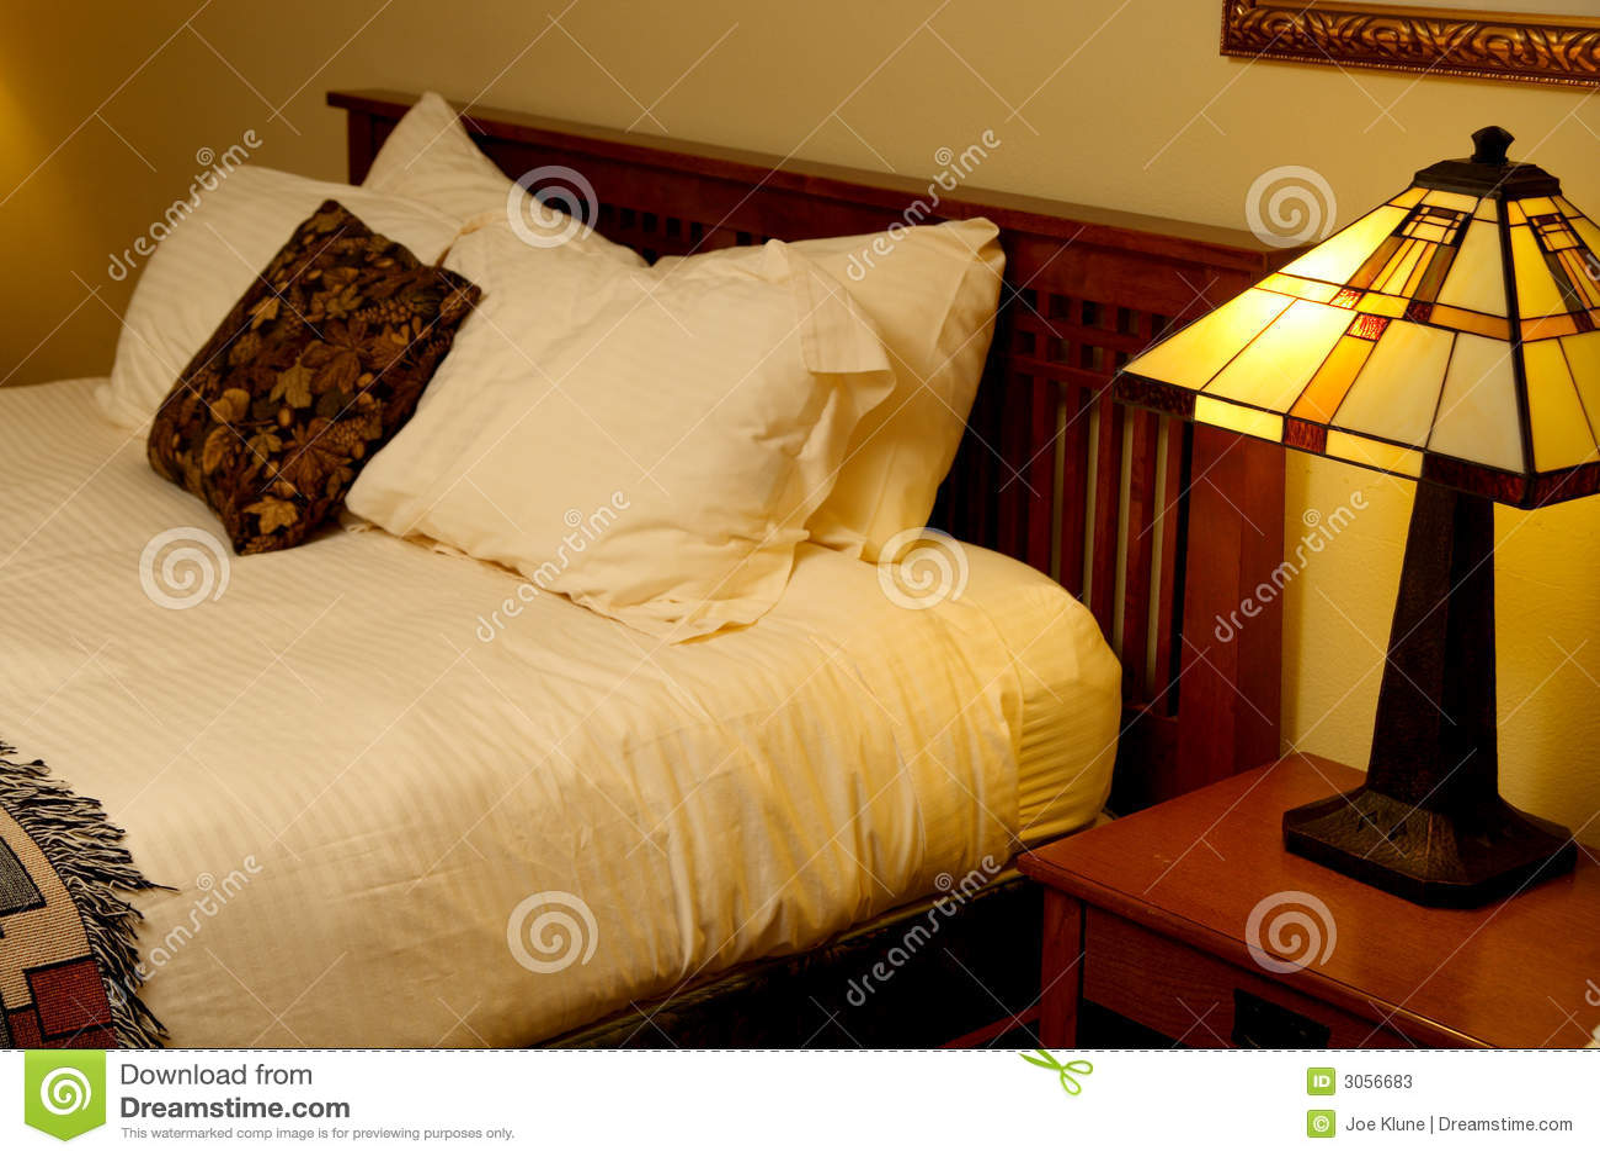 Motelraum